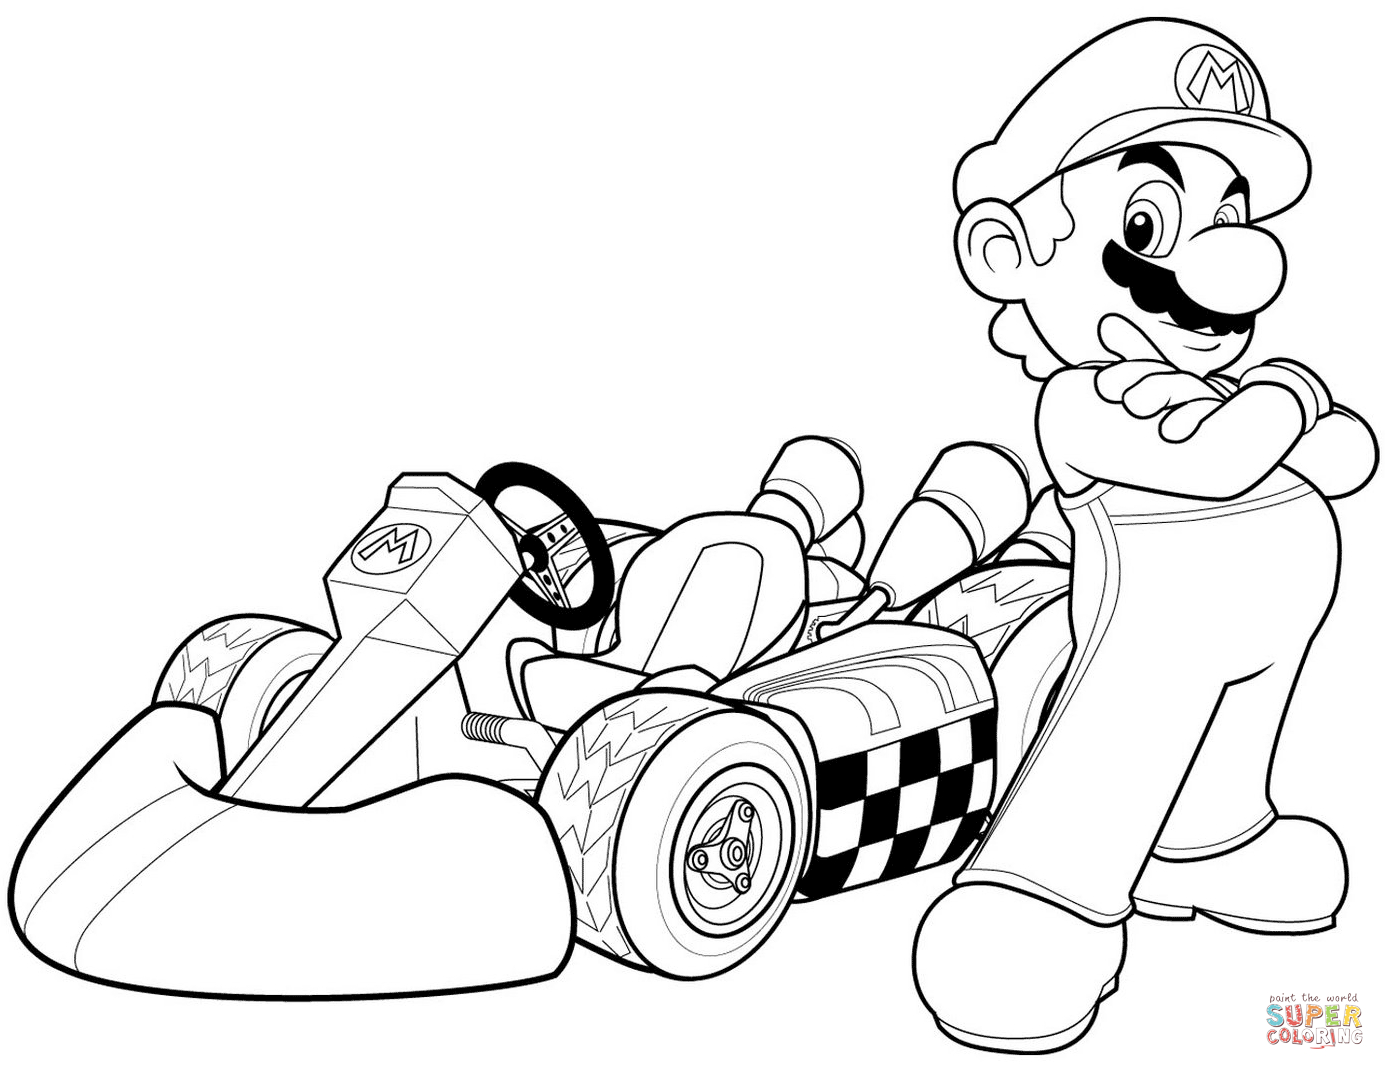 Super Mario Bros. Coloring Pages | Free Coloring Pages - Mario Coloring Pages Free Printable